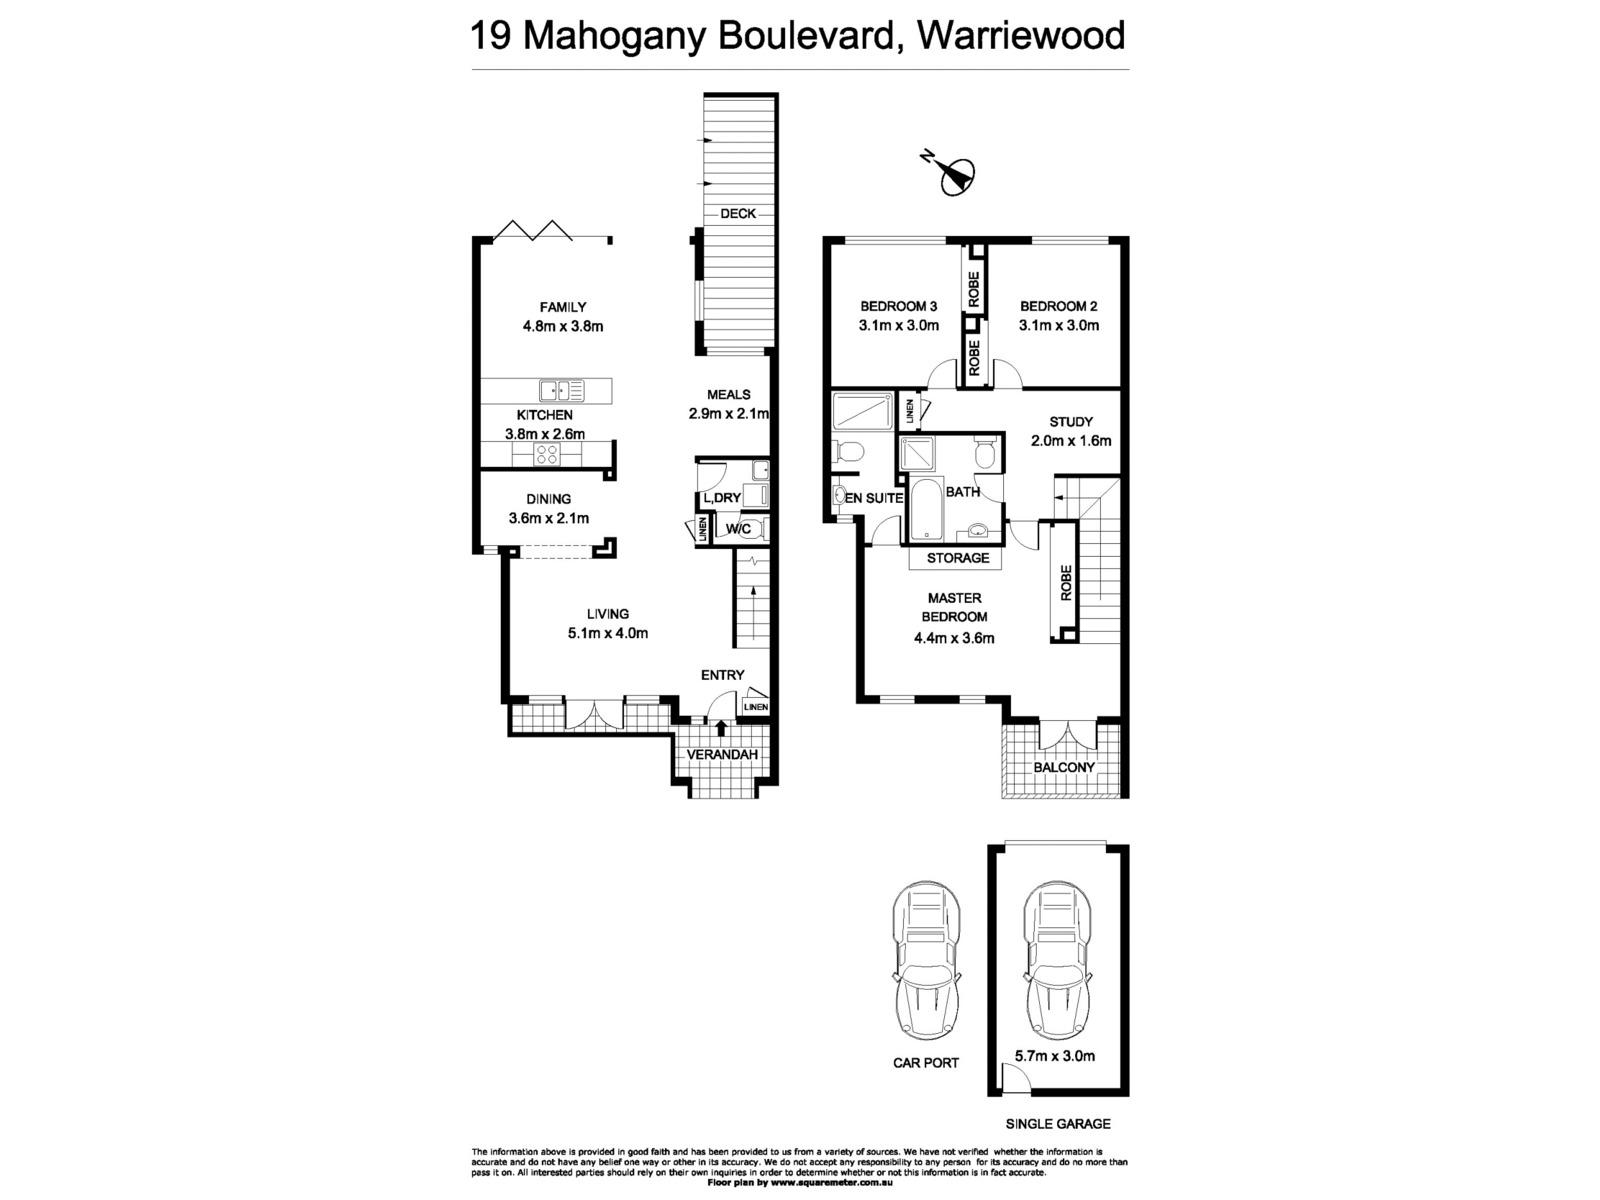 19 Mahogany Boulevard, Warriewood